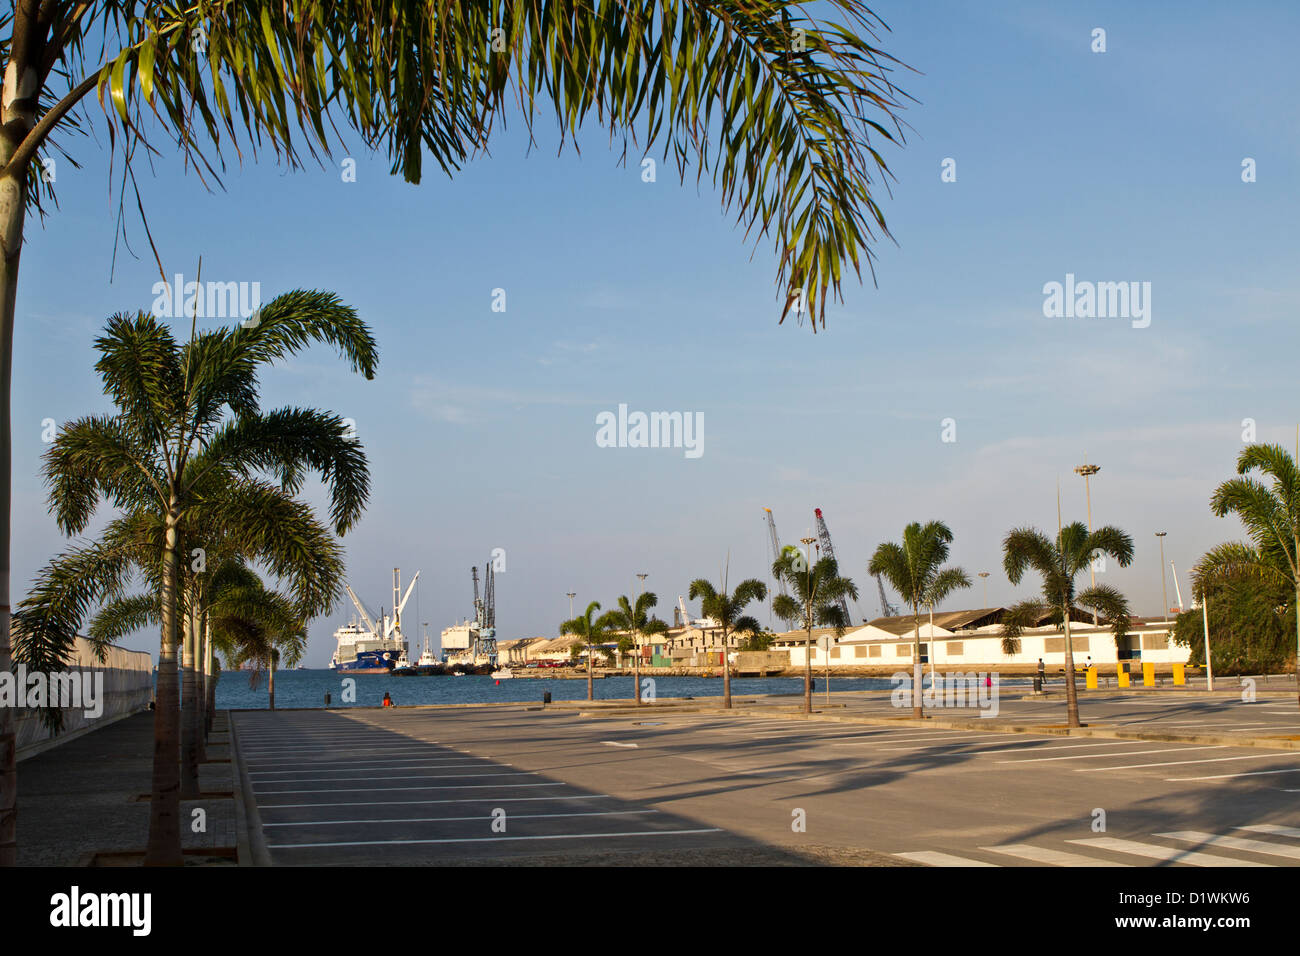 Le port de Luanda, Angola Banque D'Images